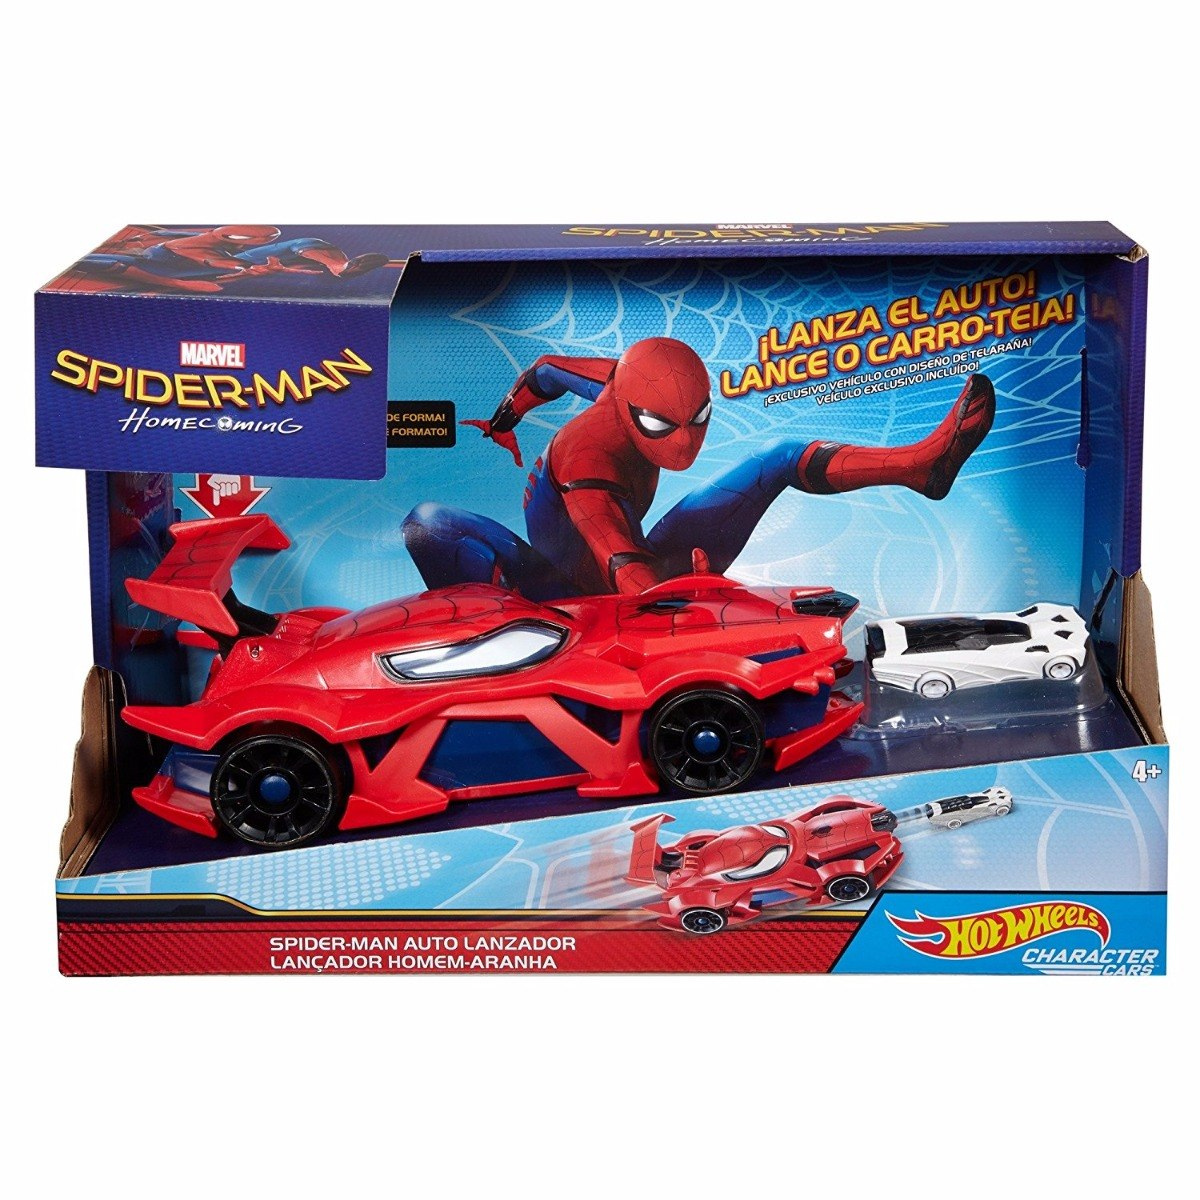 Autos Lcfkj1 Araña Hombre Hot De Wheels Juguetes Spiderman Lanzador S 5R4AjL